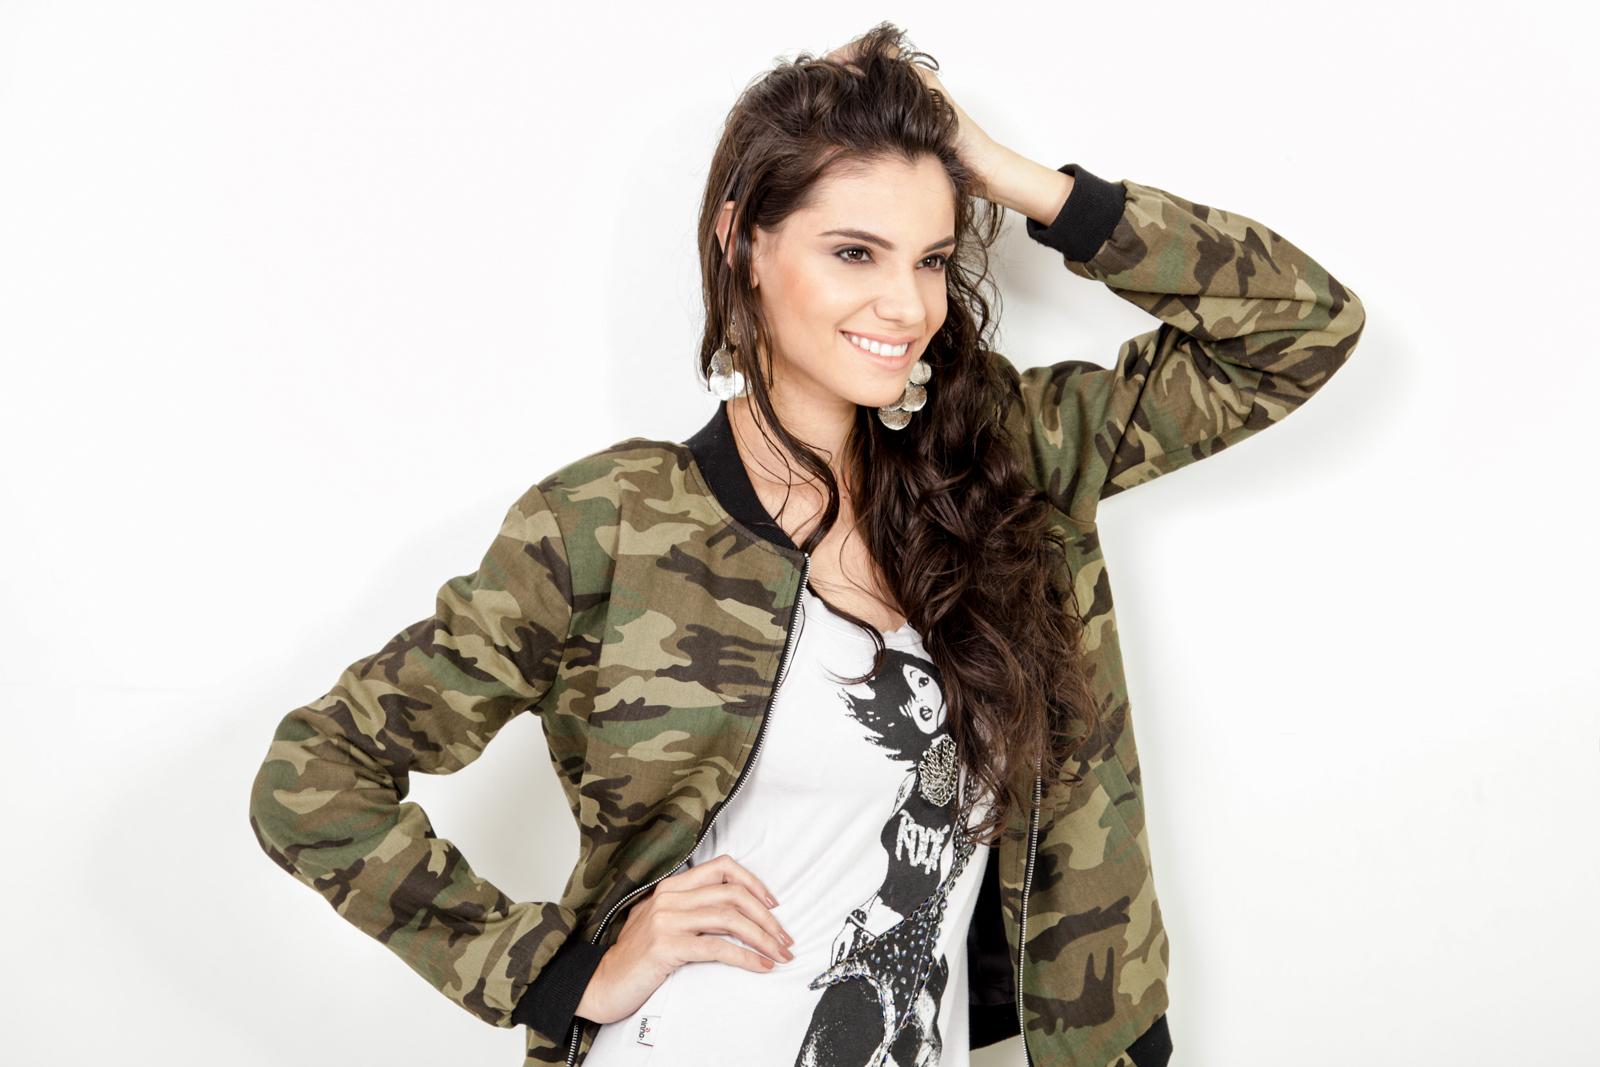 Paola Mota